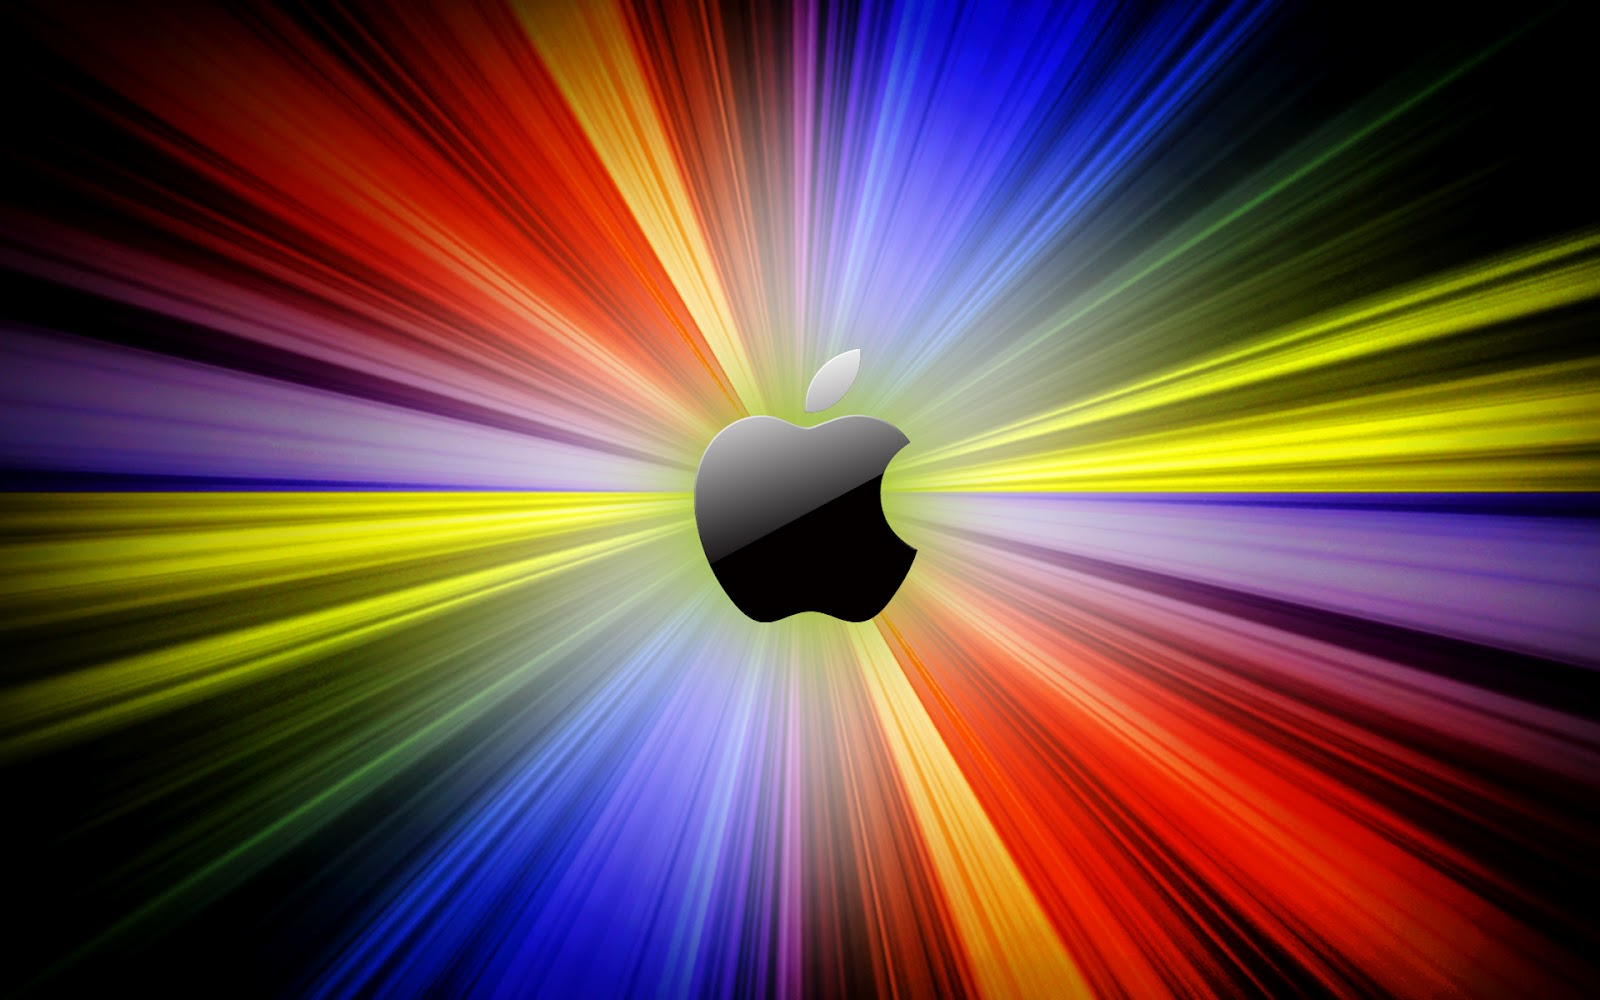 Wallpapers HD: Apple - Mac (30) Wallpapers (Fondo de Pantalla) HD - Poster, Manzana